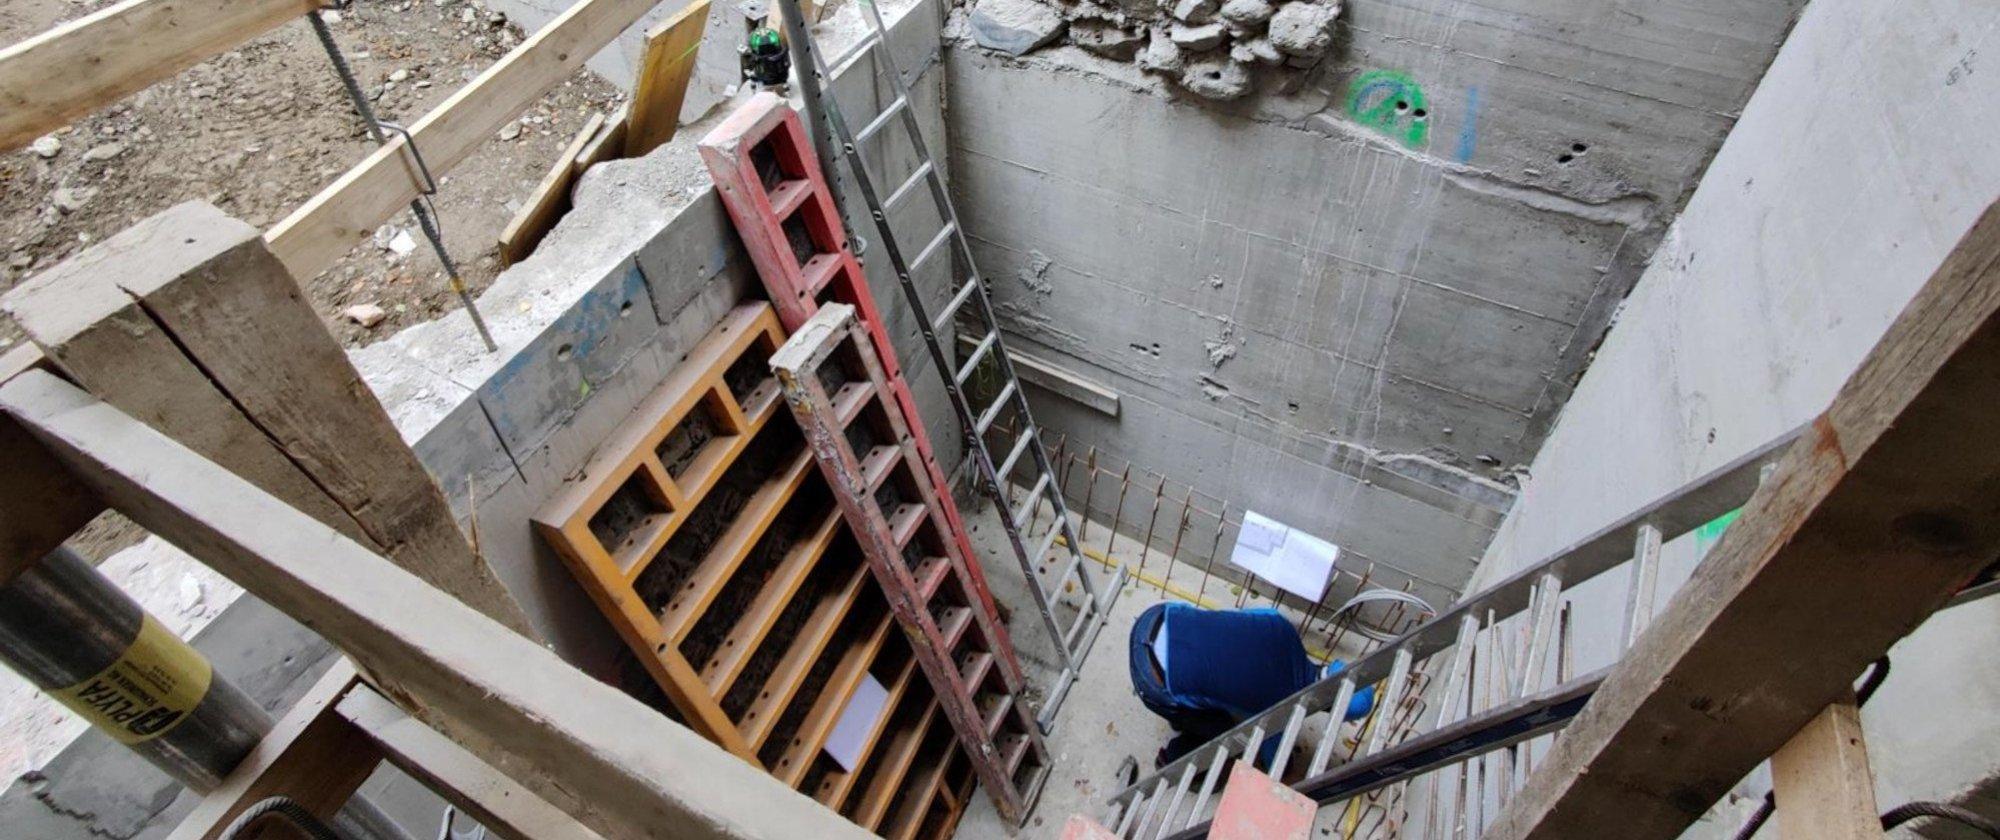 neue Kellerräume mit Wandunterfangungen